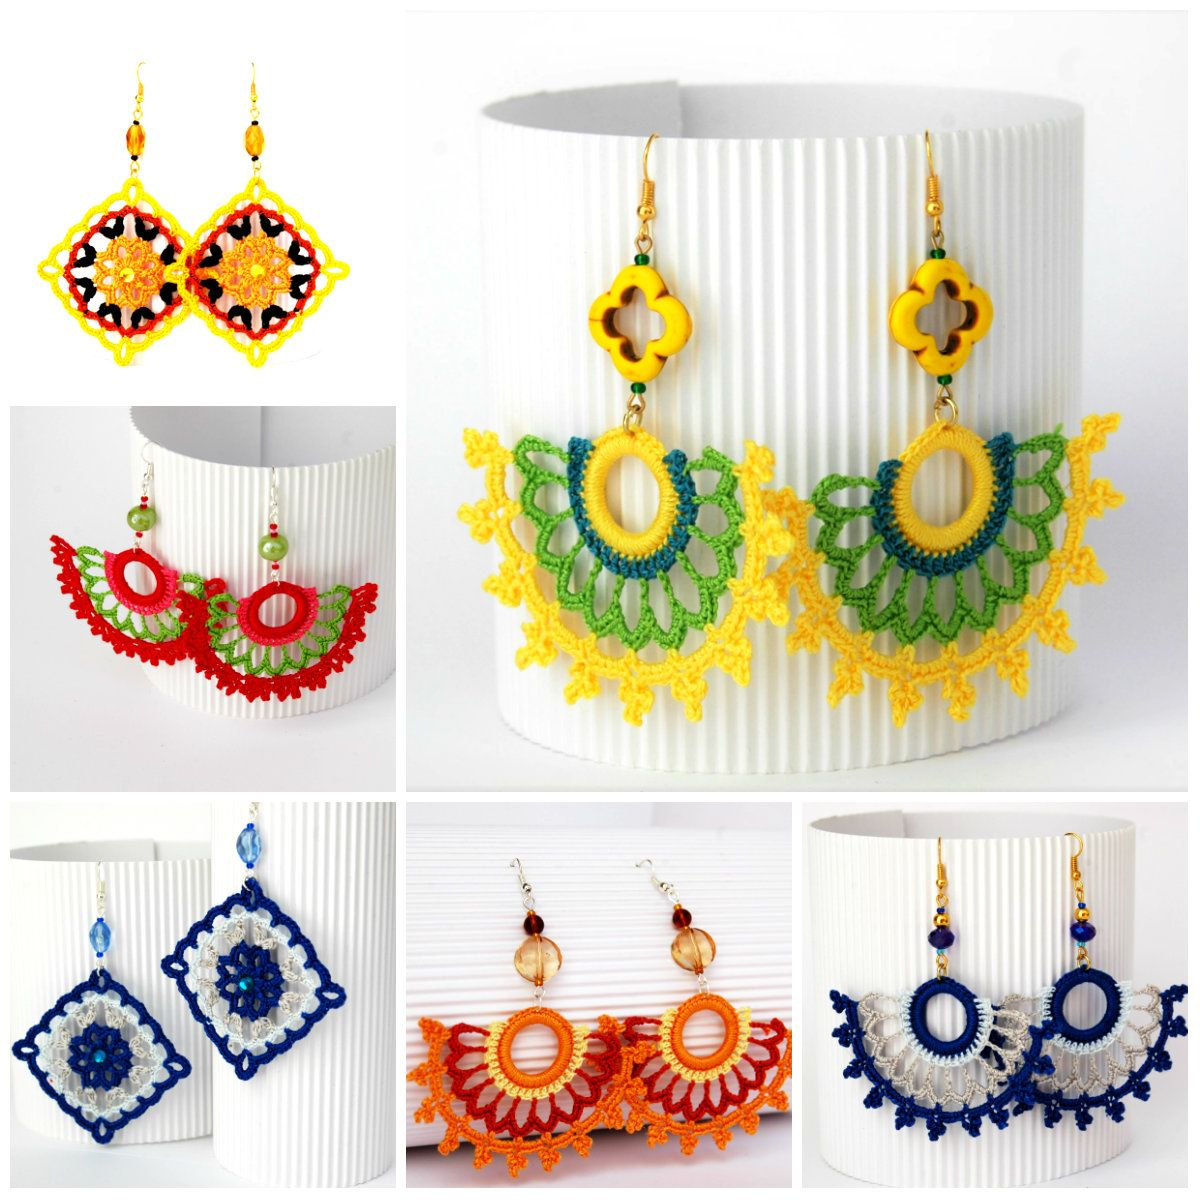 Crochet earrings - Pendientes de ganchillo - Lindapaula | Crochet ...